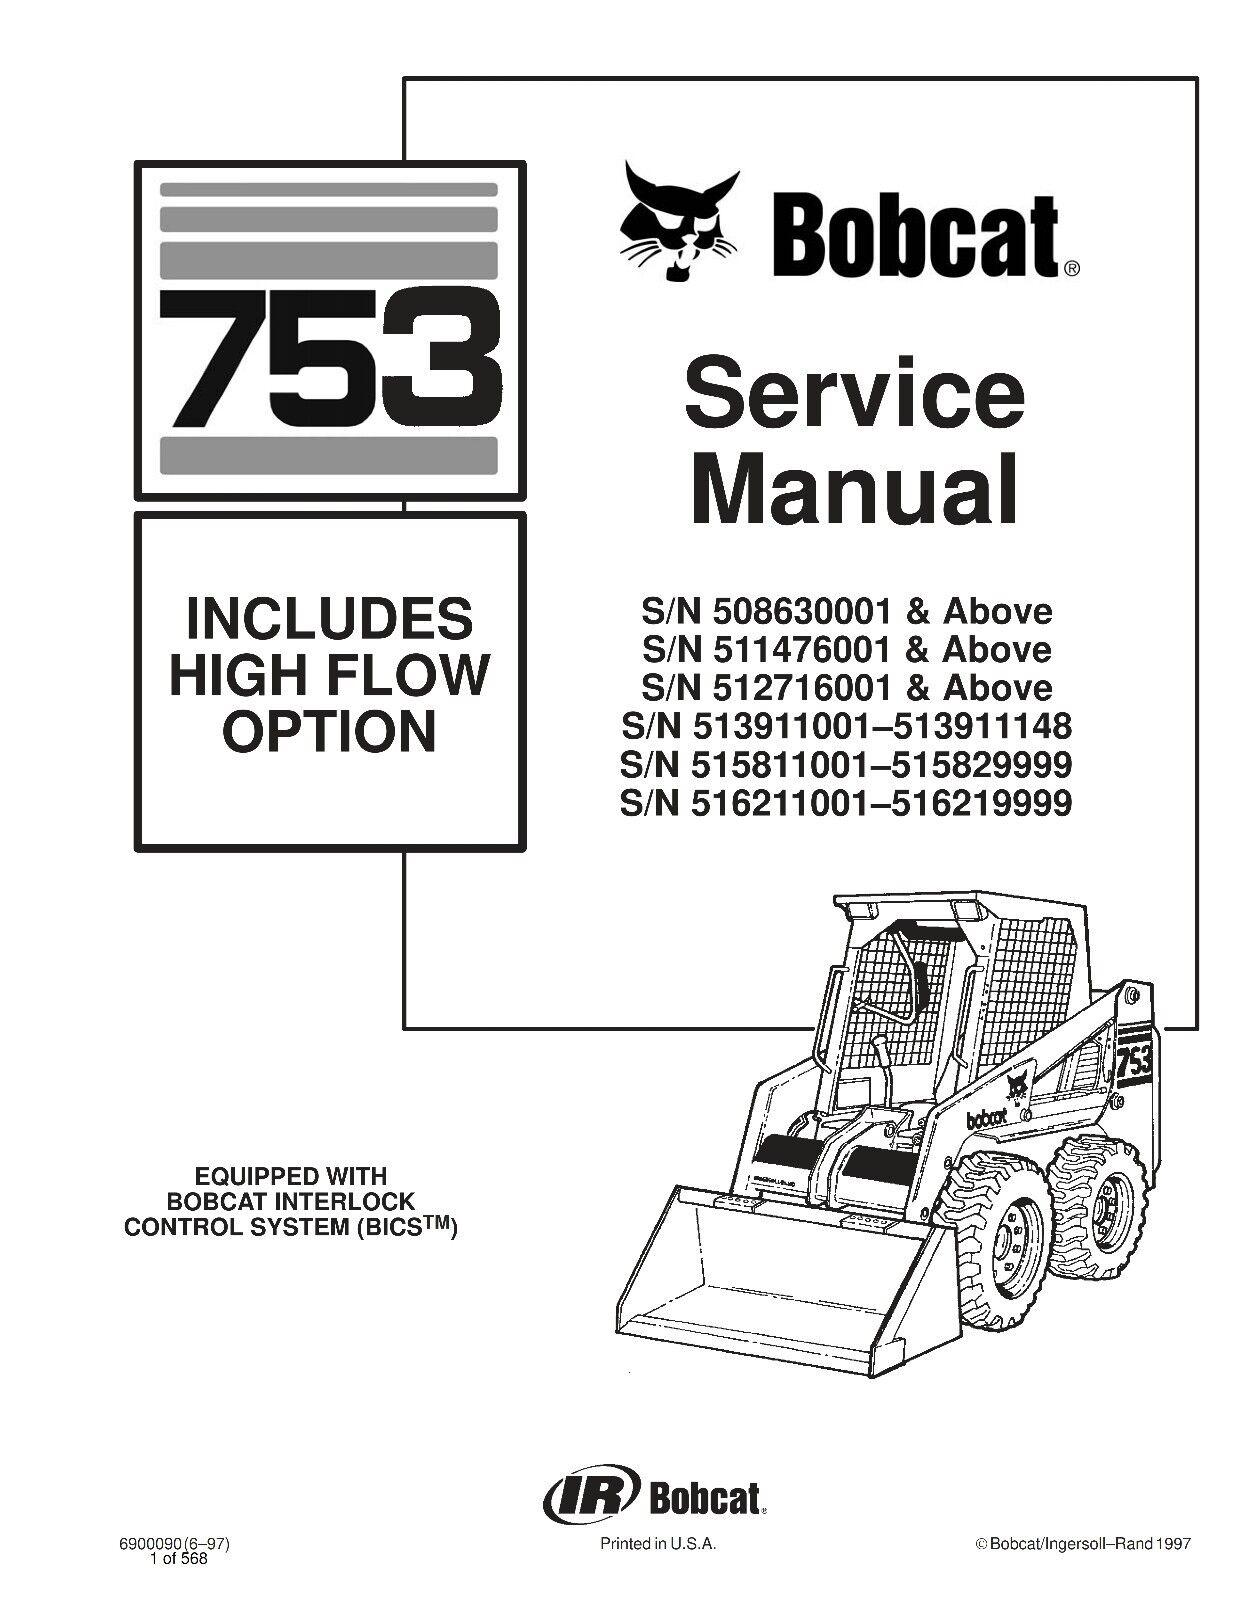 hight resolution of bobcat interlock control system wiring schematic